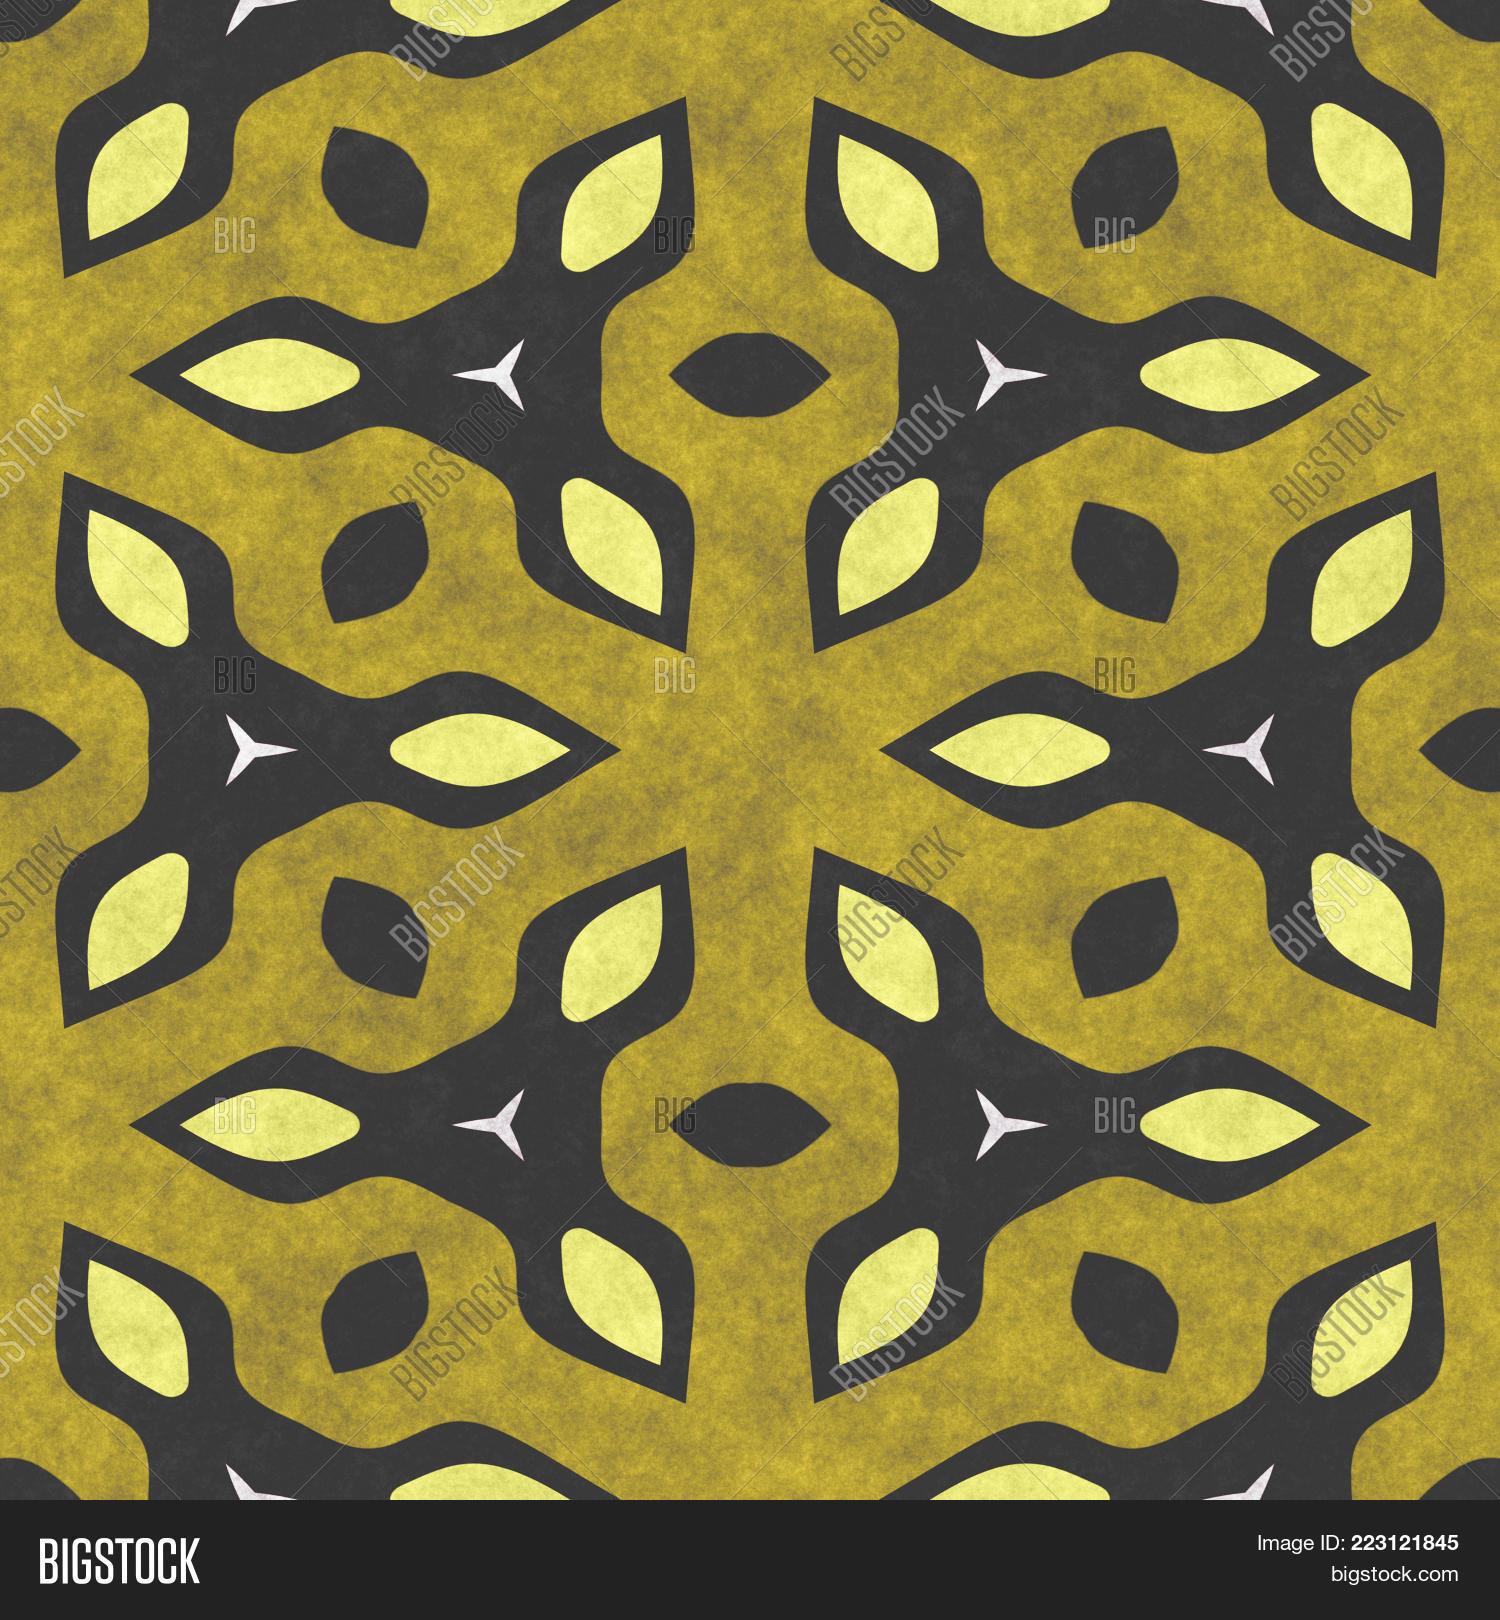 Sacred Geometry Image & Photo (Free Trial) | Bigstock